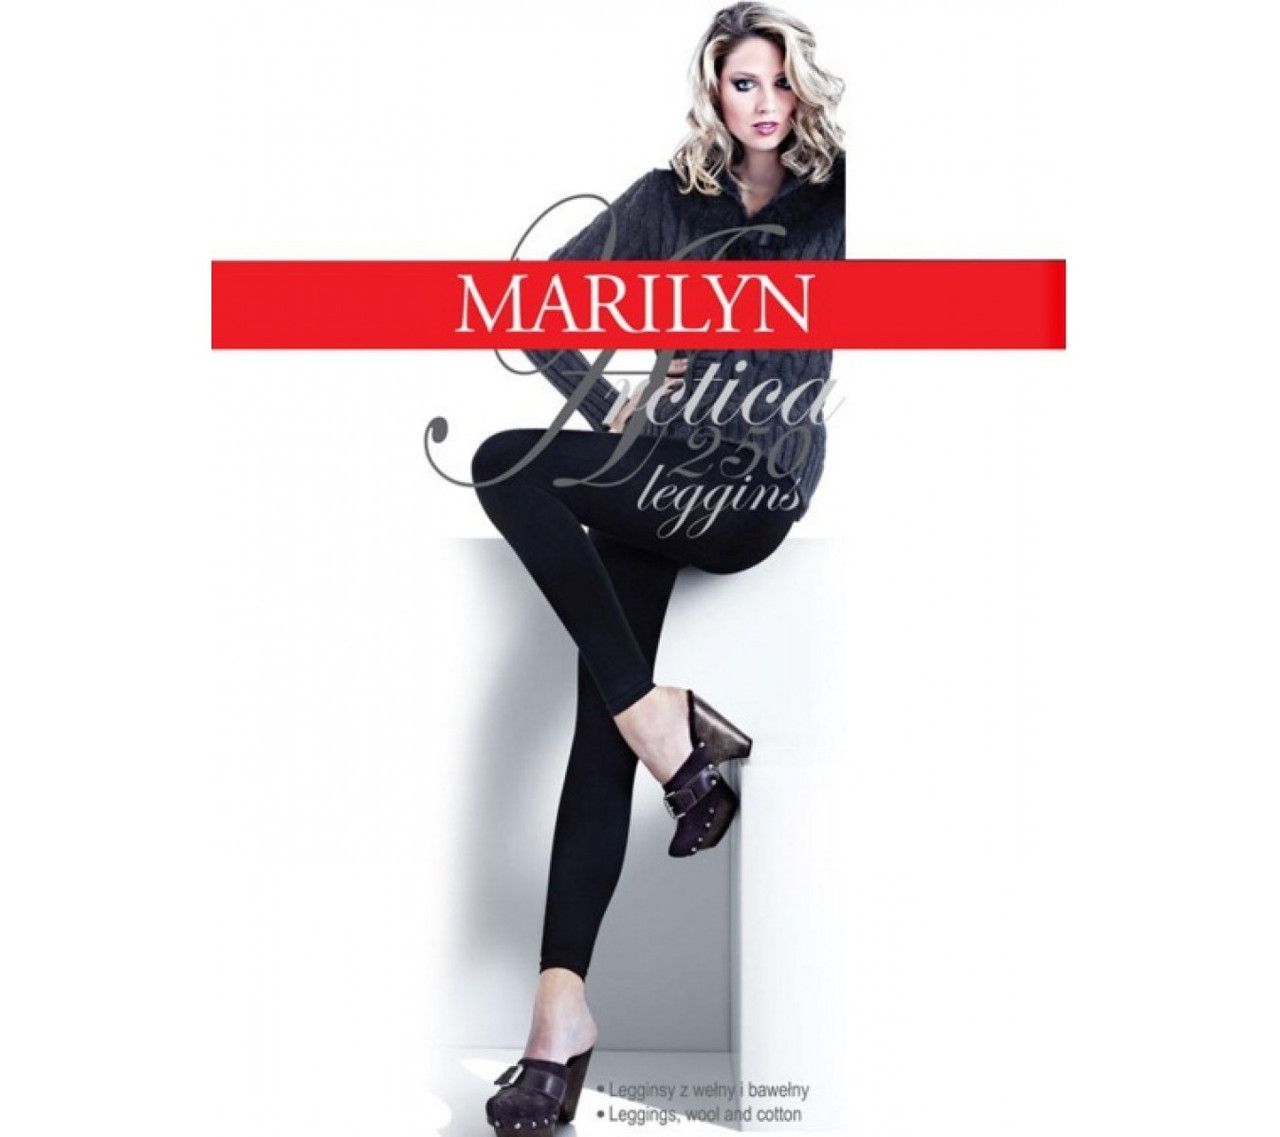 Marilyn Arctica 250 леггинсы теплые